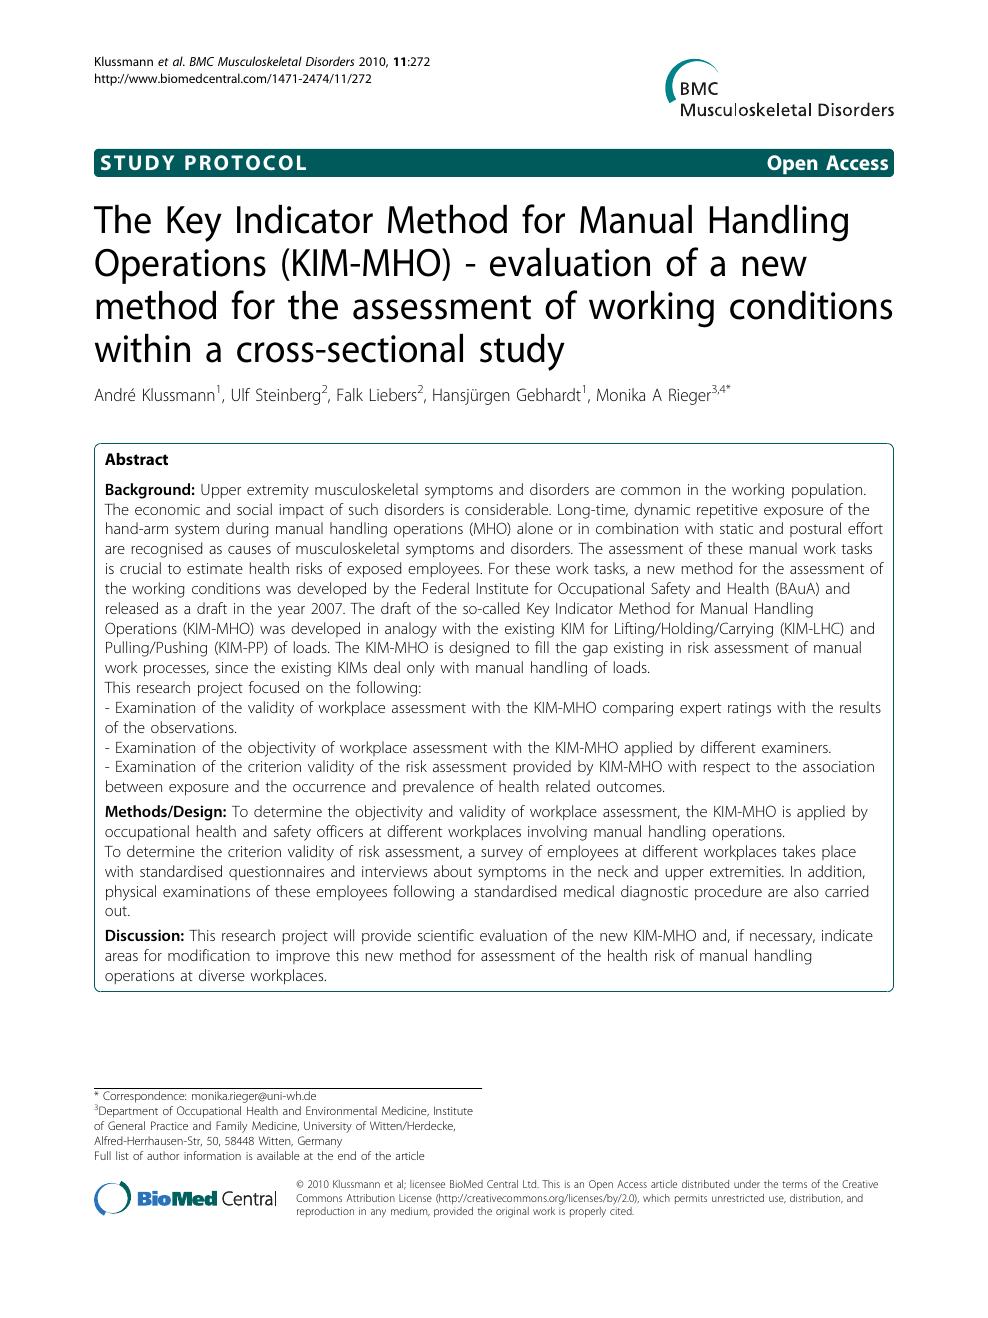 The Key Indicator Method for Manual Handling Operations (KIM